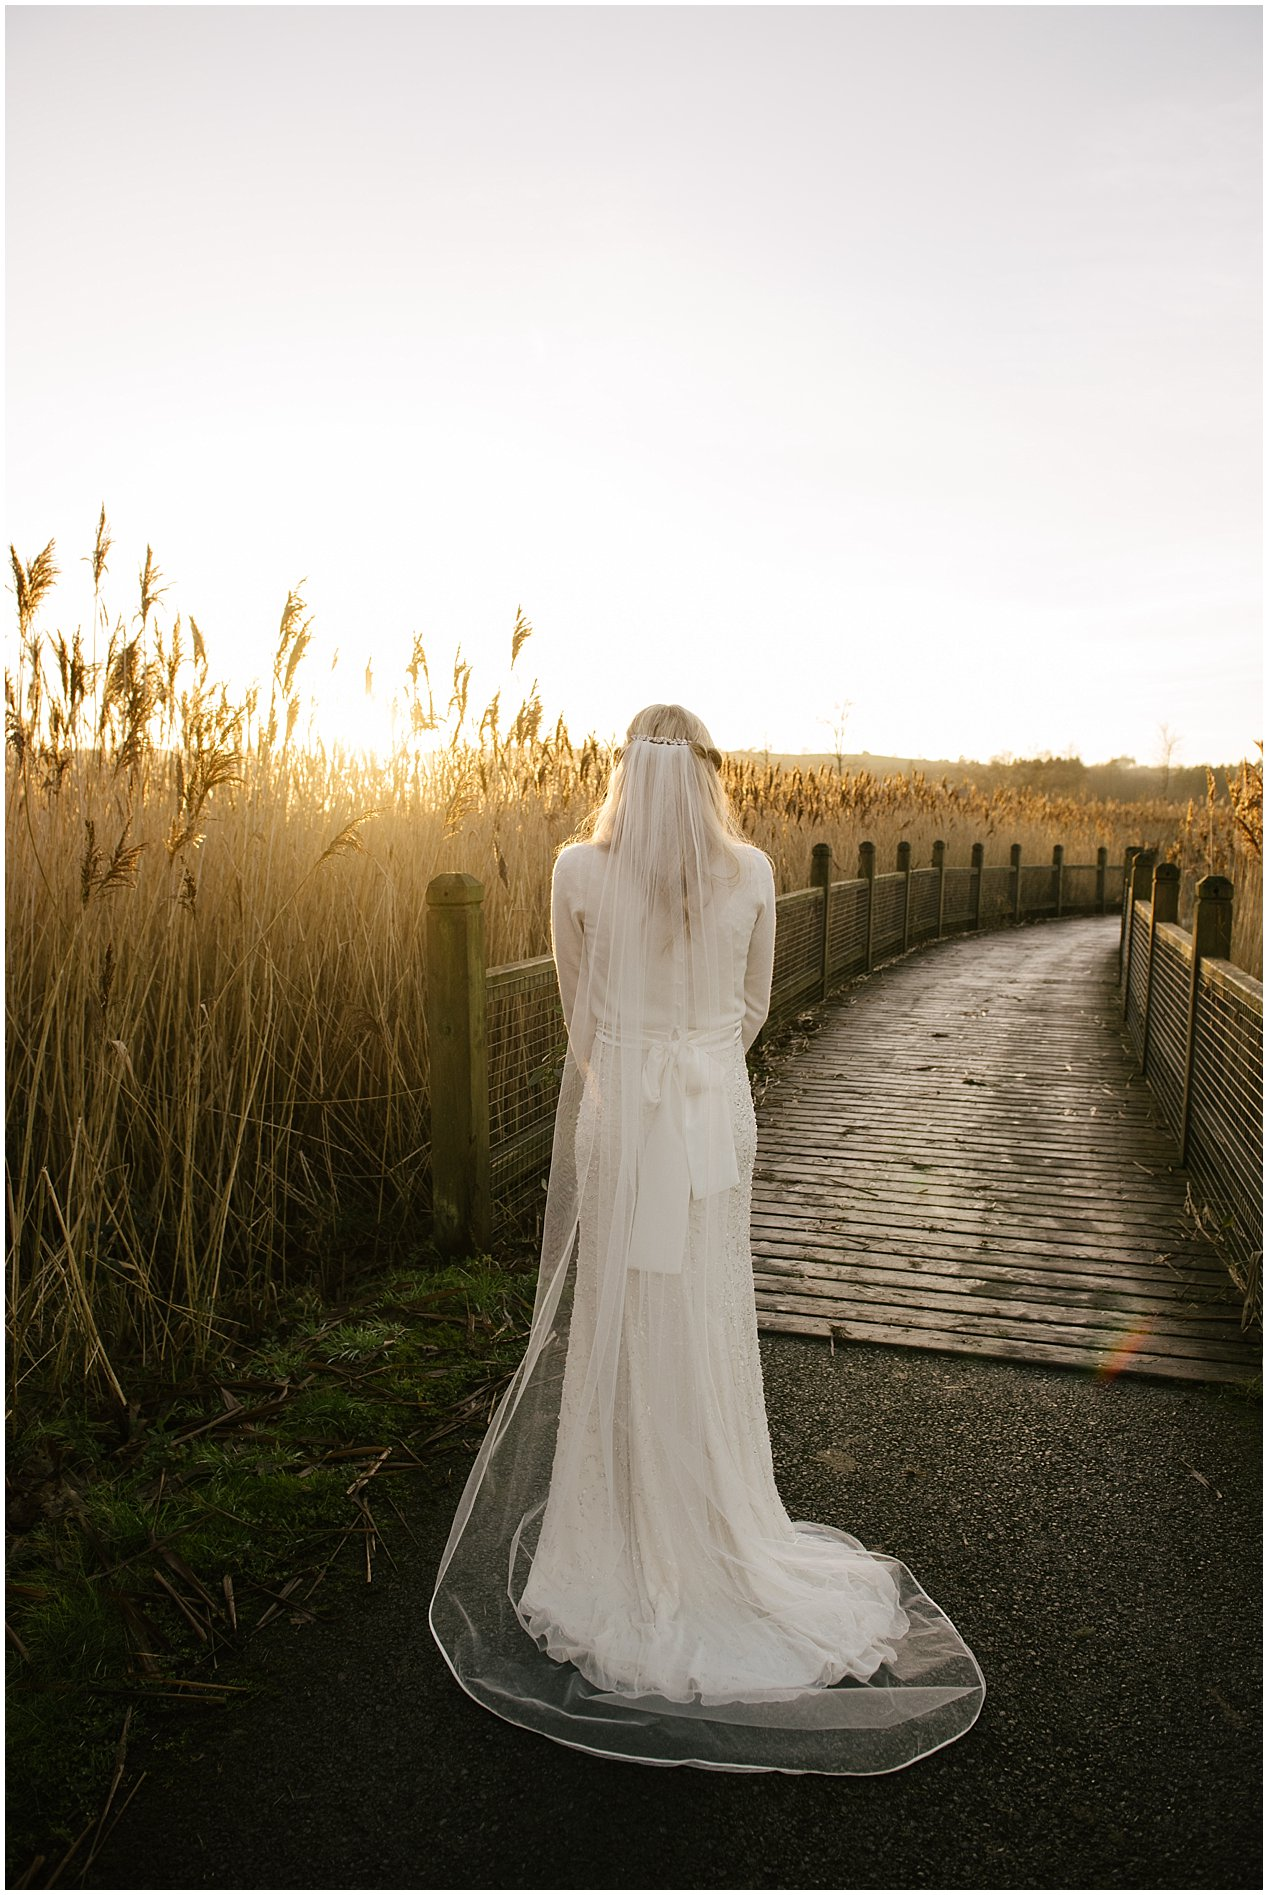 jill_Chris_Lough_Erne_Resort_Wedding_0138.jpg